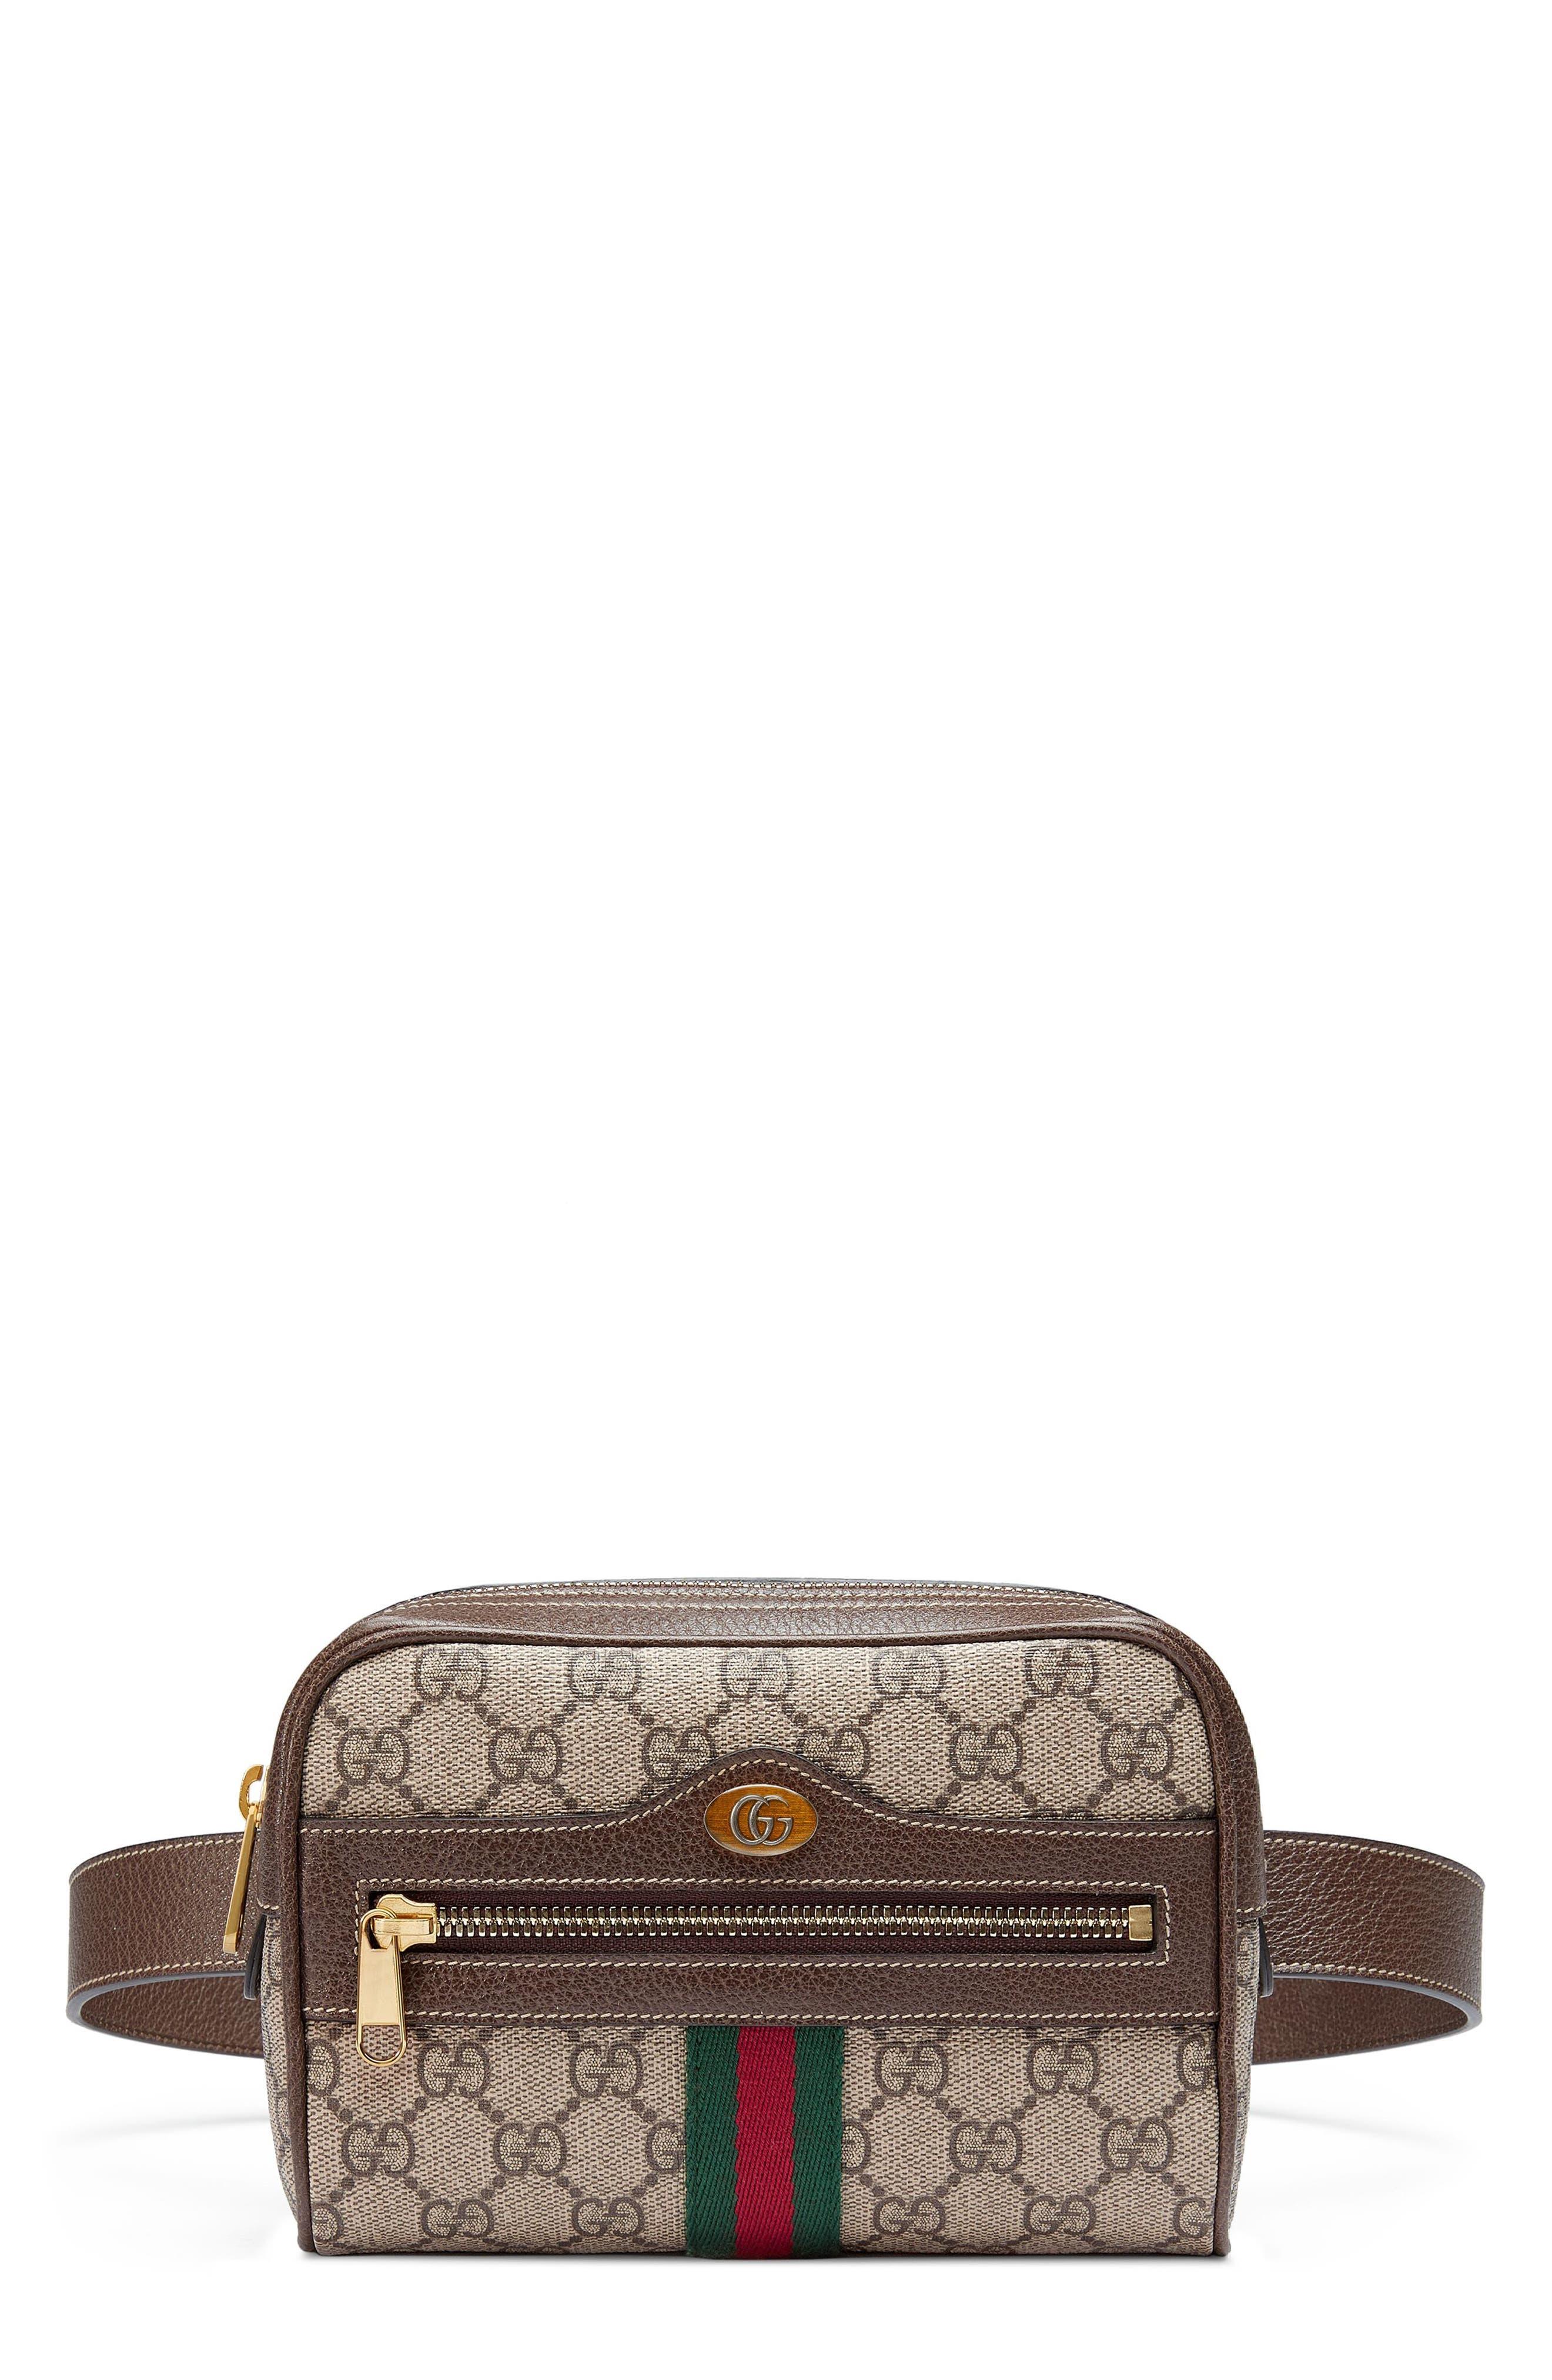 Gucci Small Ophidia GG Supreme Canvas Belt Bag